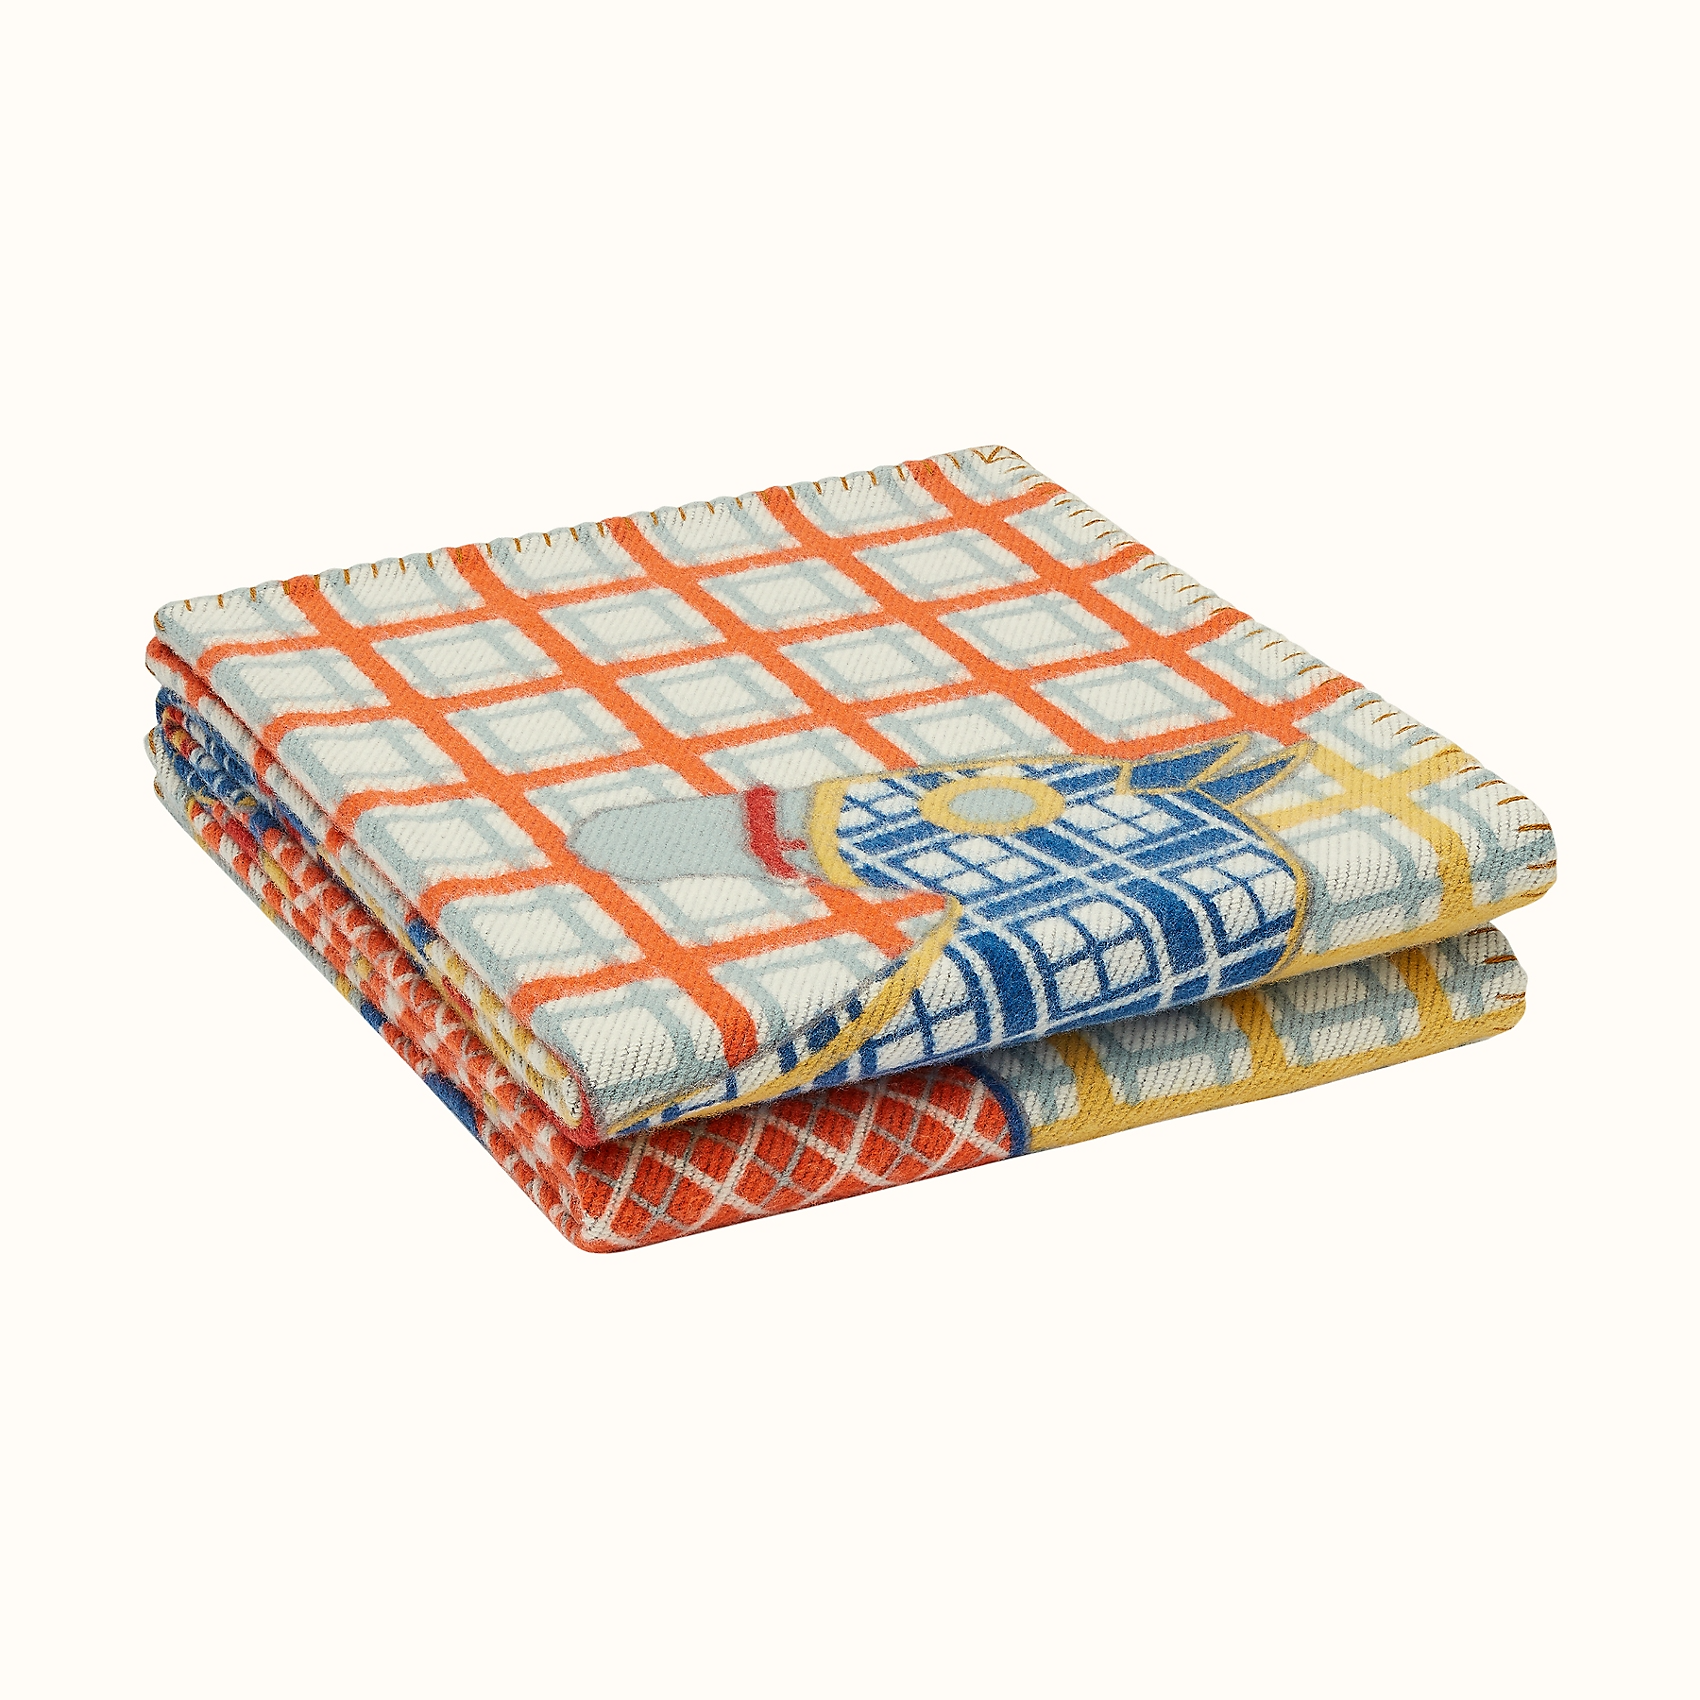 HERMES Pour Sortir Blanket